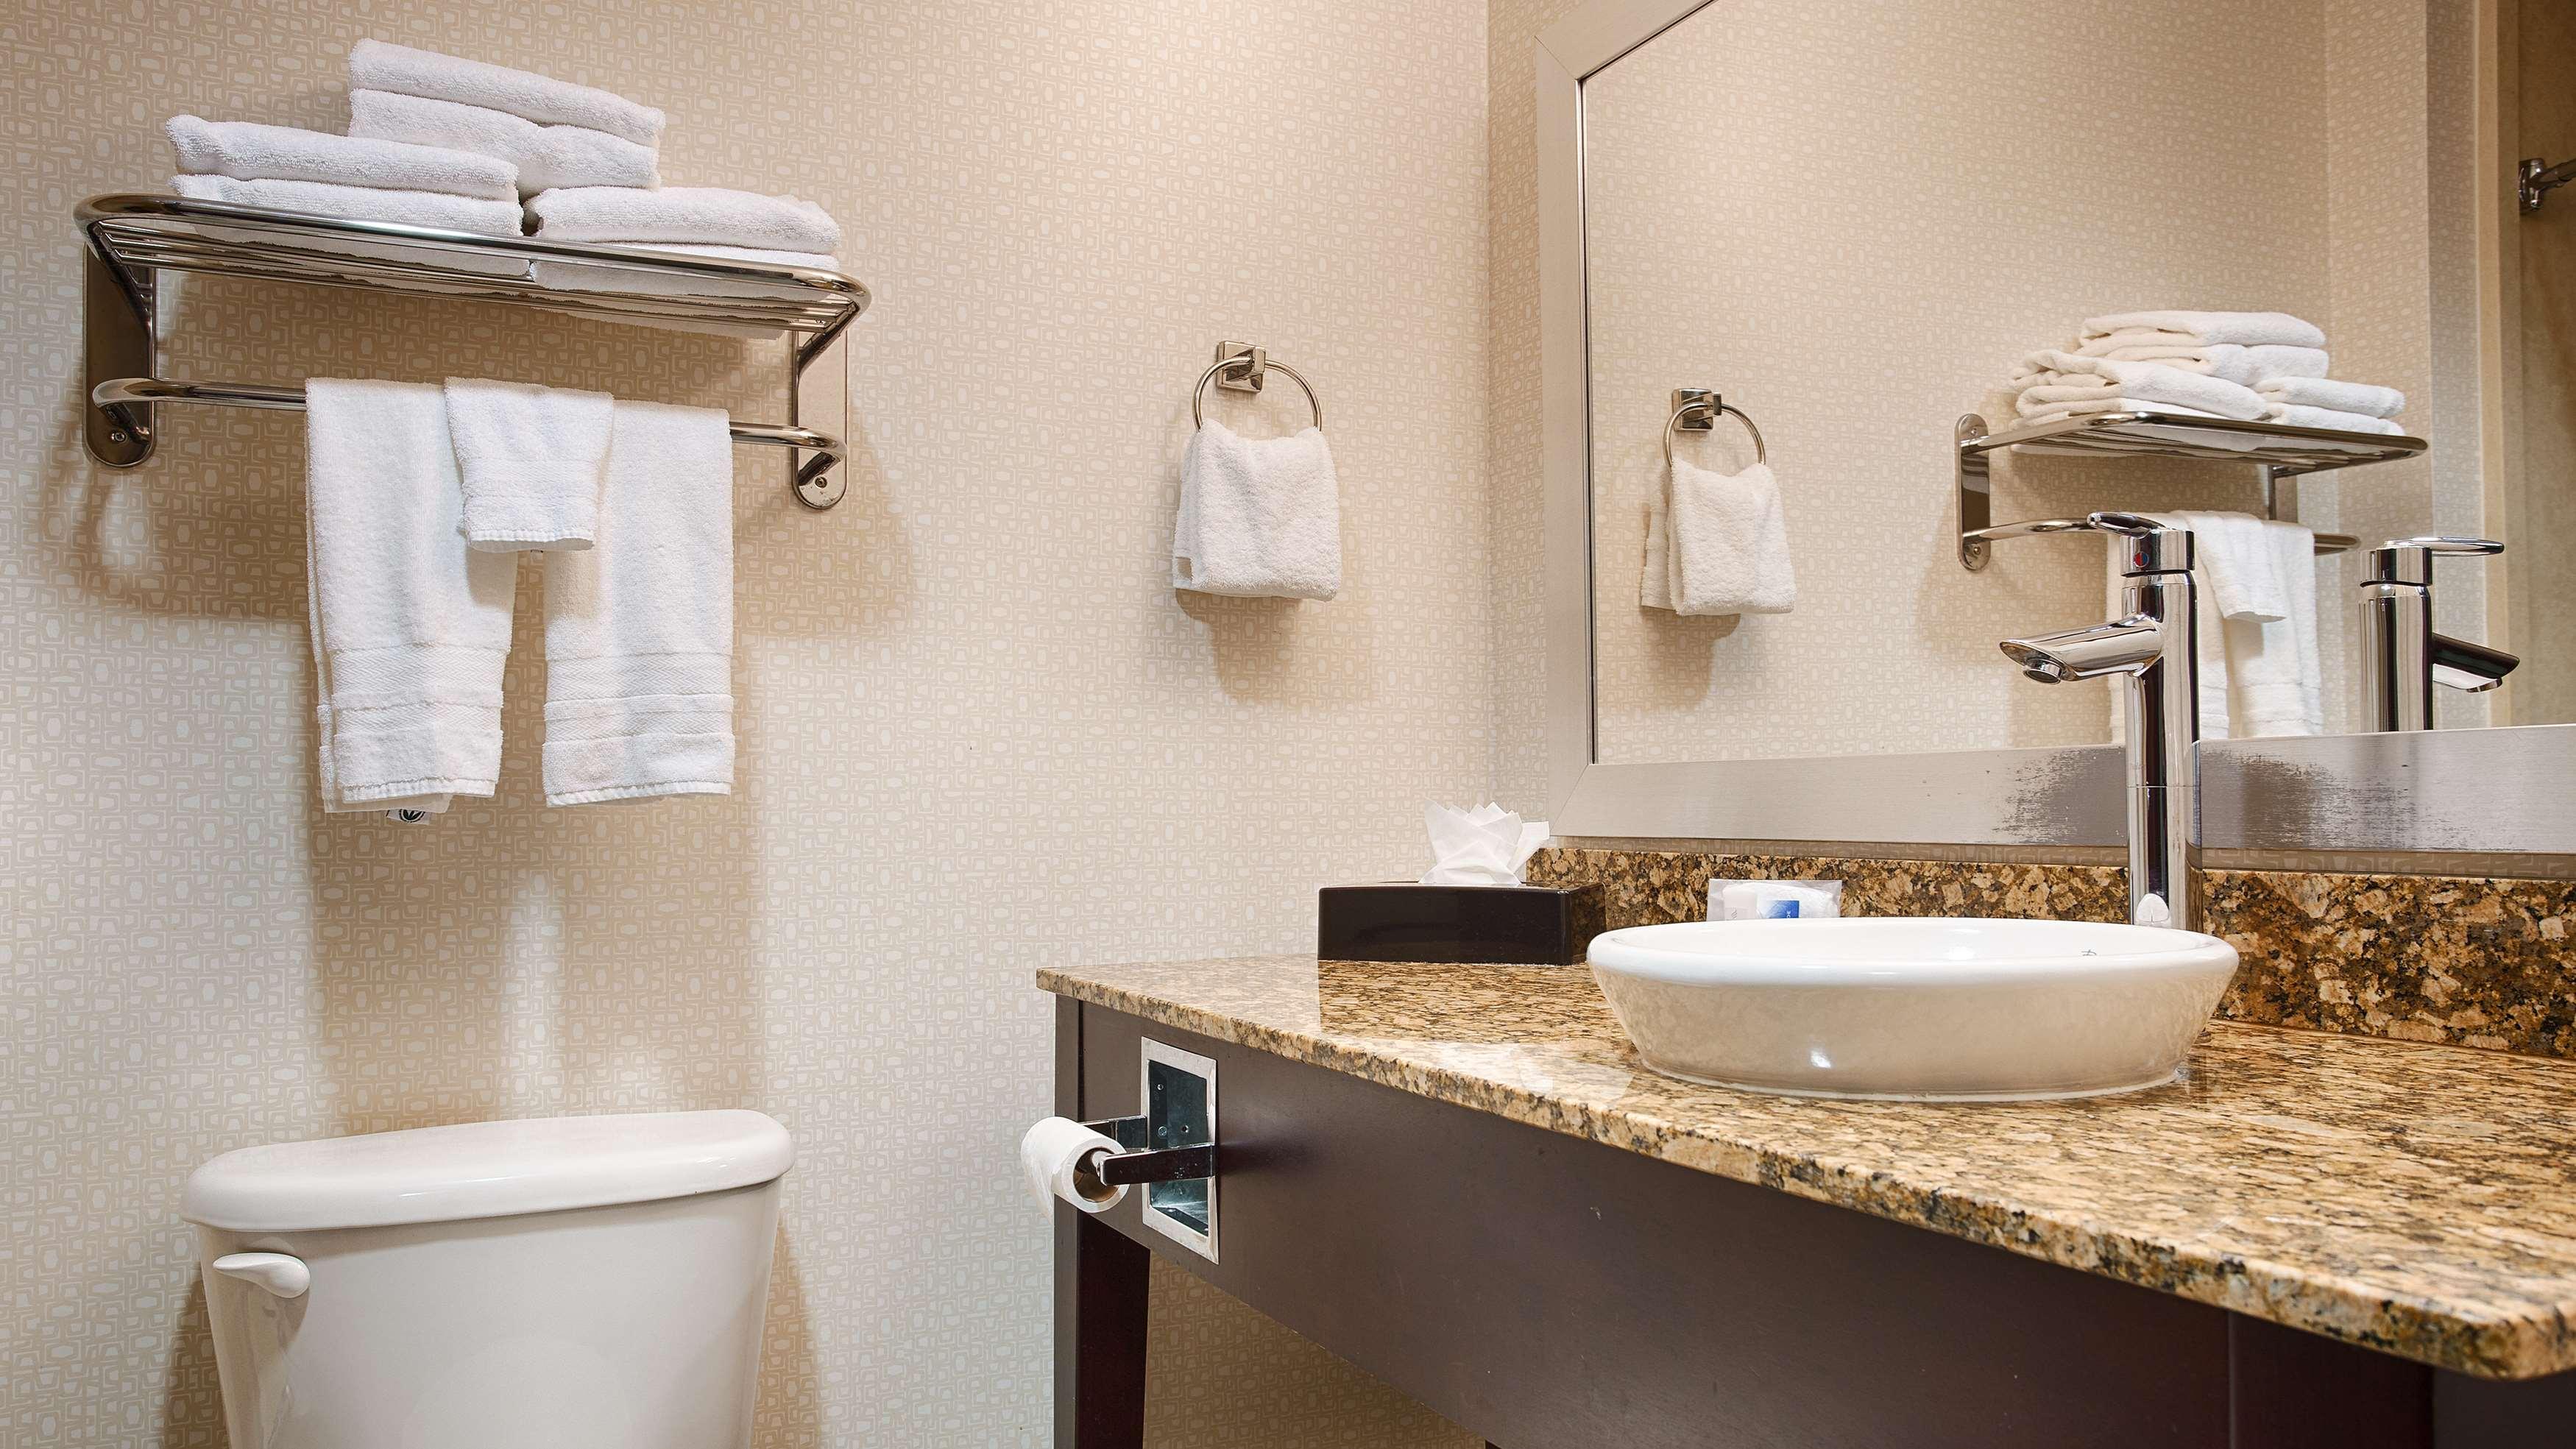 Best Western Plus Fort Lauderdale Airport South Inn & Suites image 17